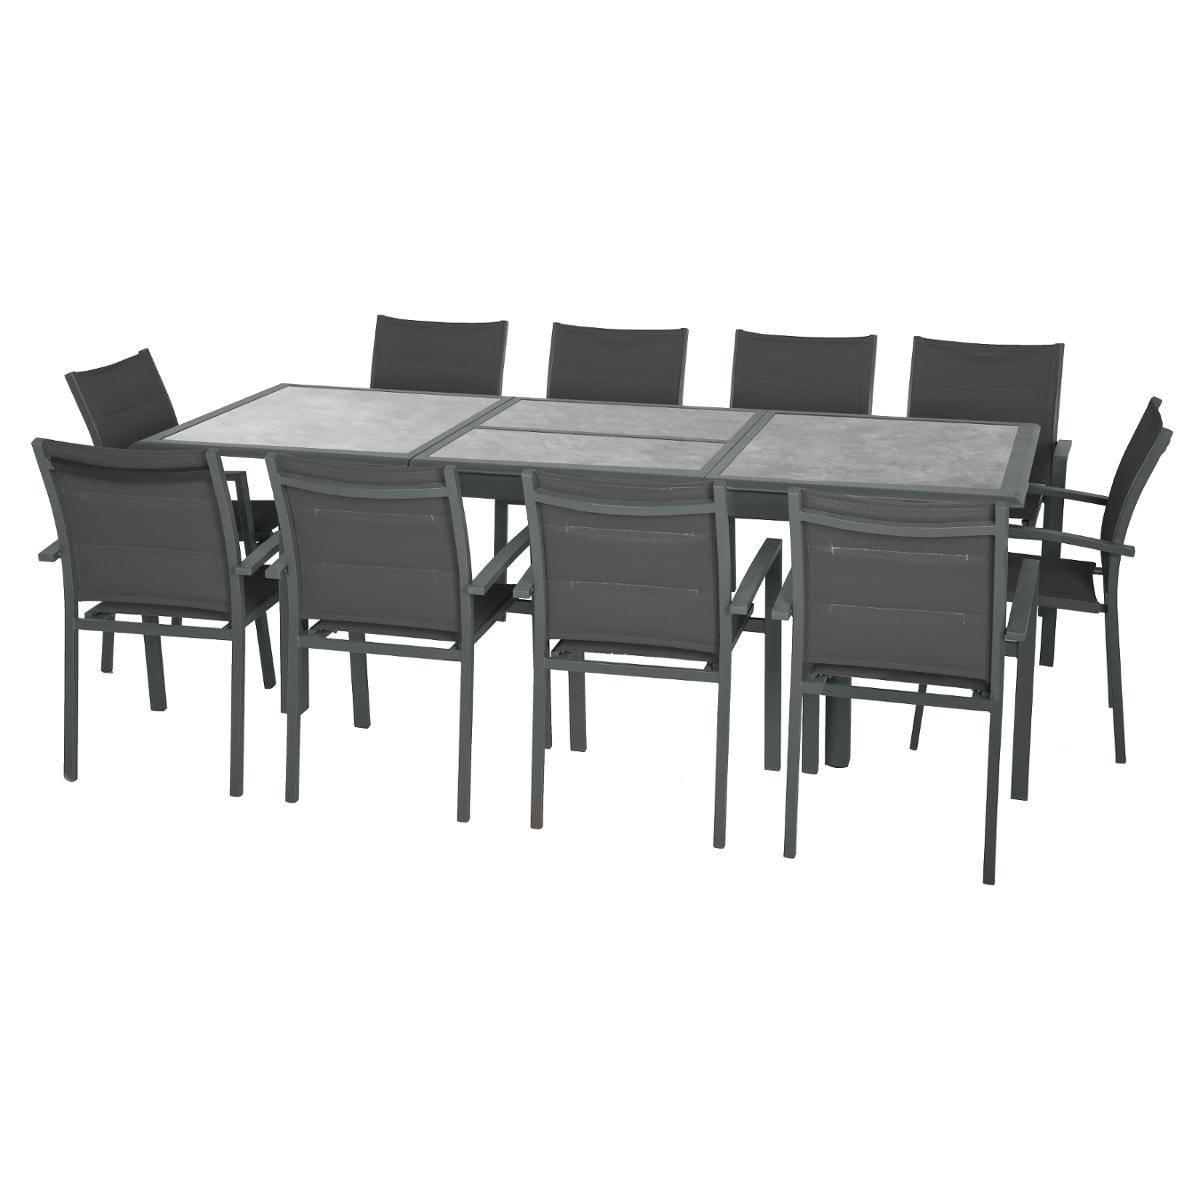 Table De Jardin Extensible Azua Storm & Graphite , Hesperide tout Table Céramique Jardin